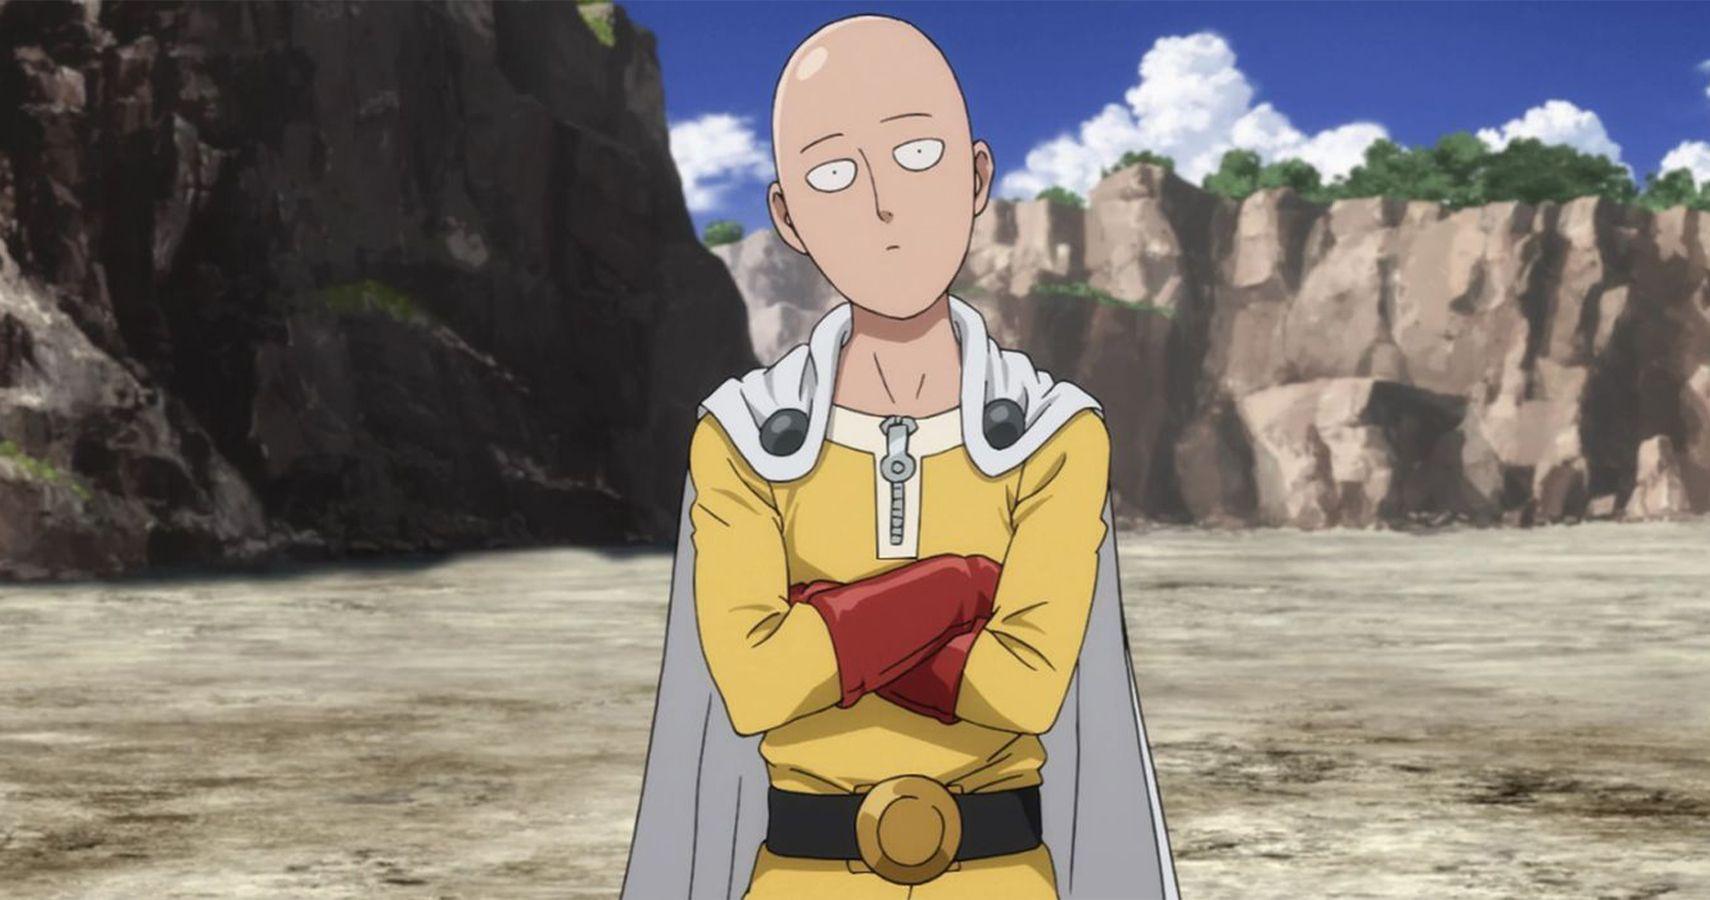 One Punch Man Saitama - One Punch Man: 10 Crazy Saitama Fan Theories That Could ...